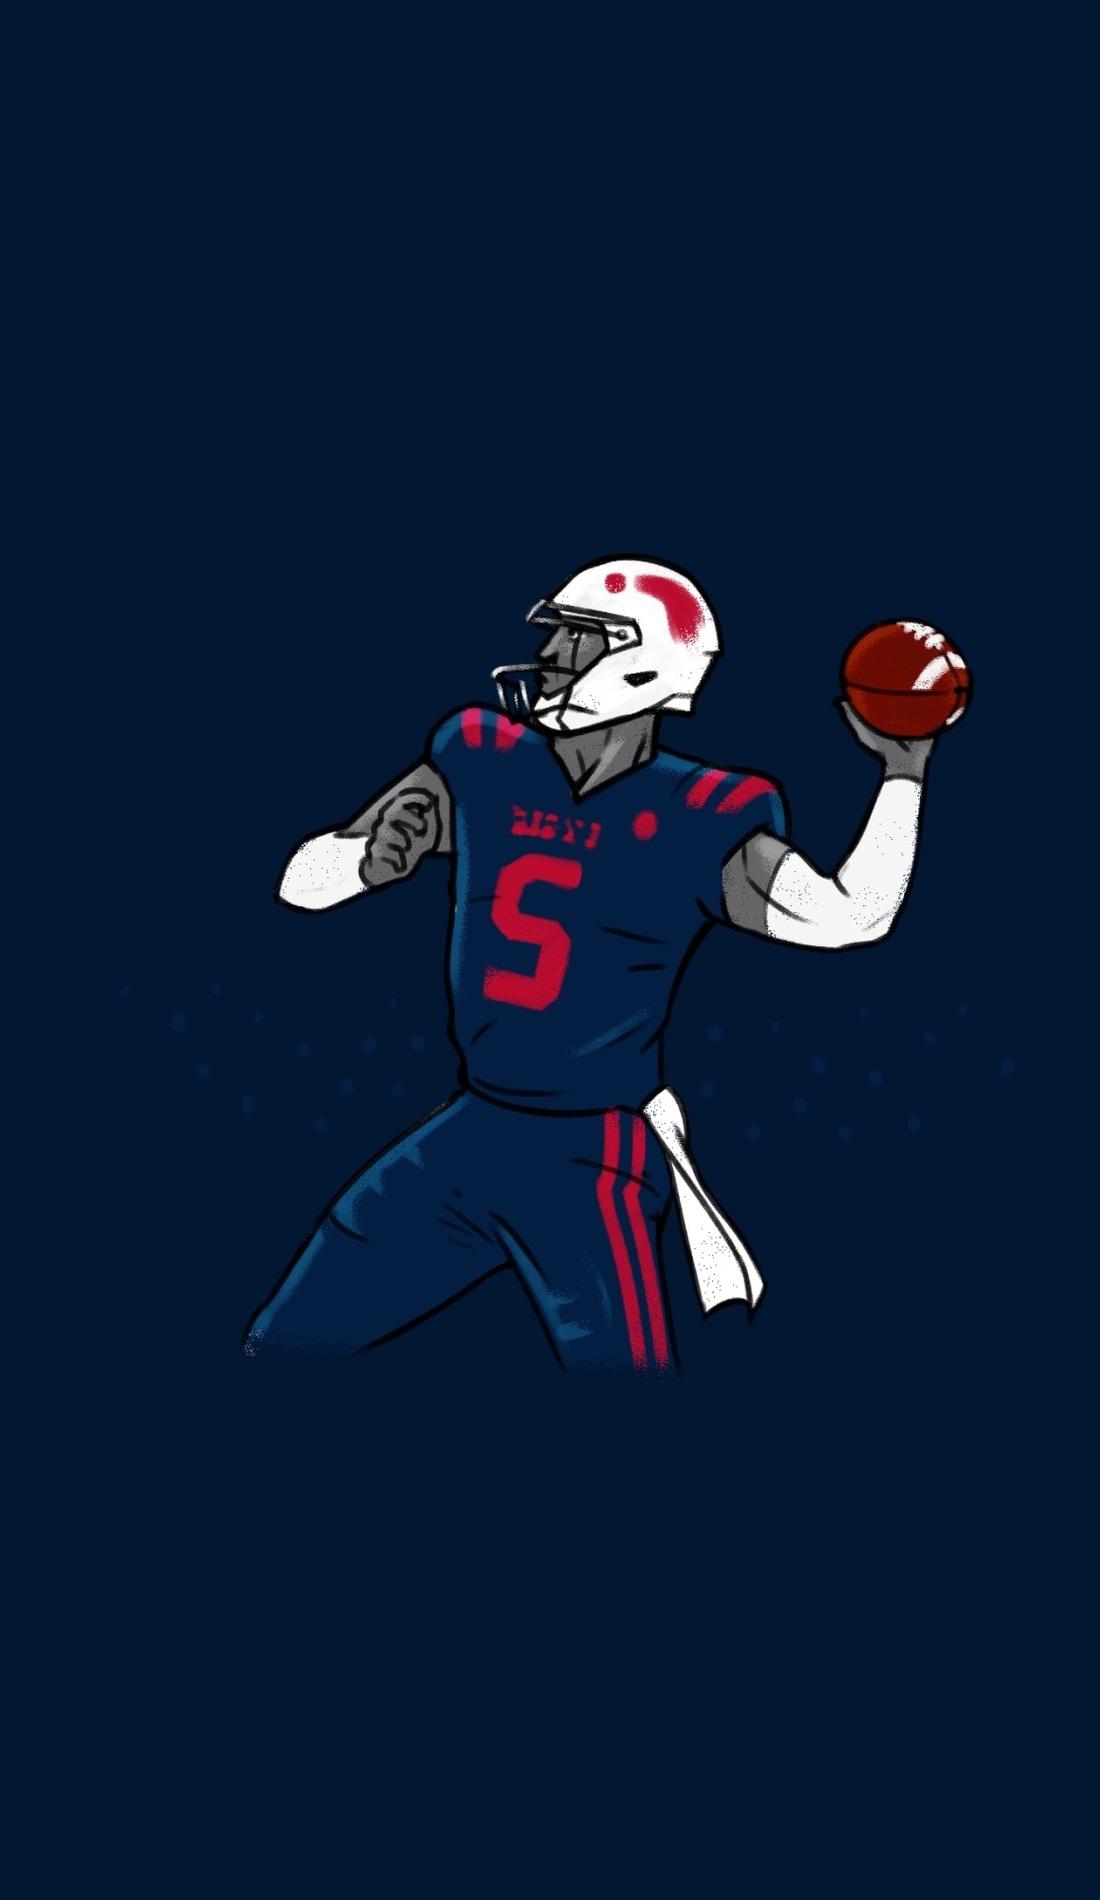 A Duquesne Dukes Football live event